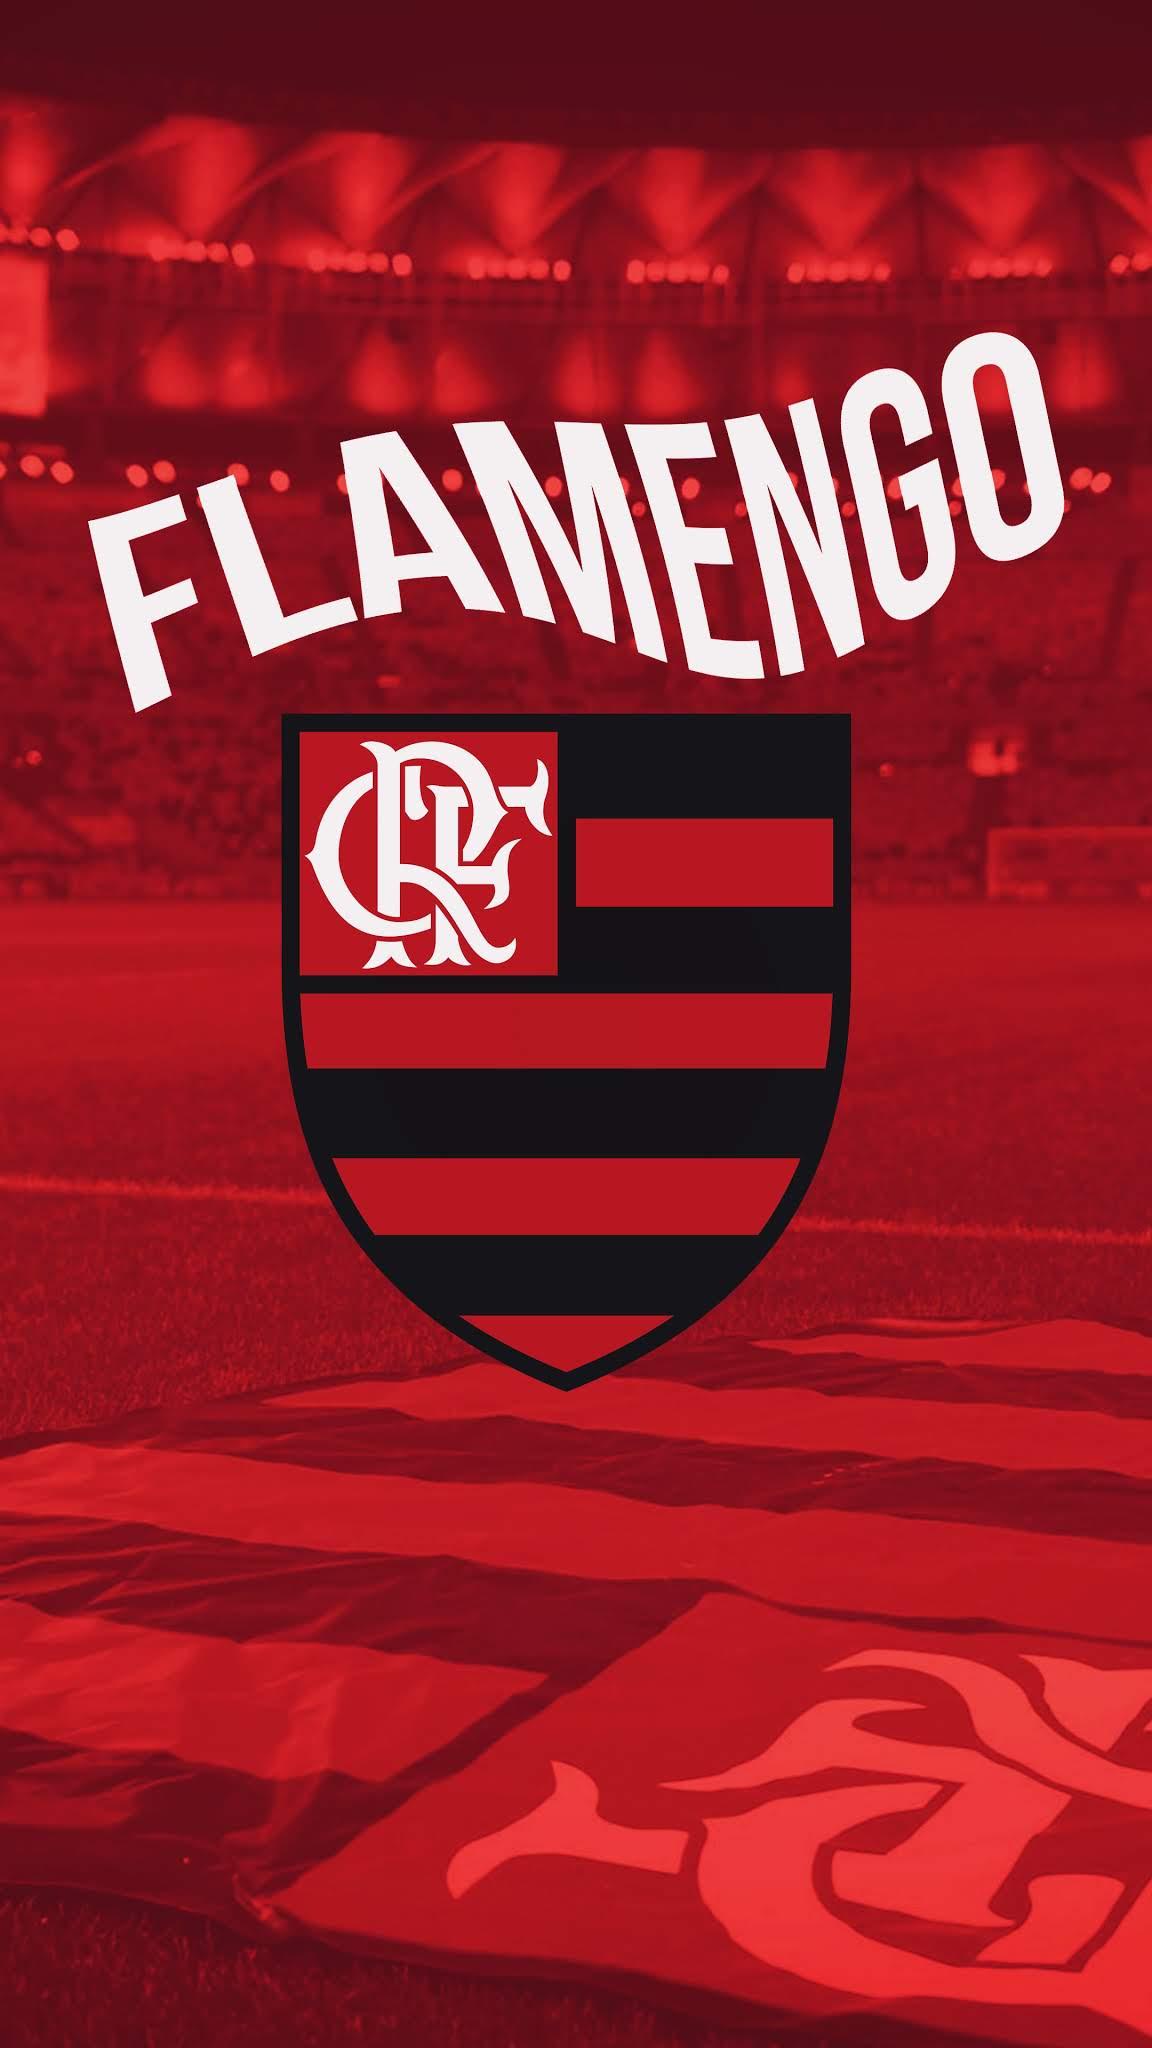 Flamengo Papel De Parede Tumblr Celular